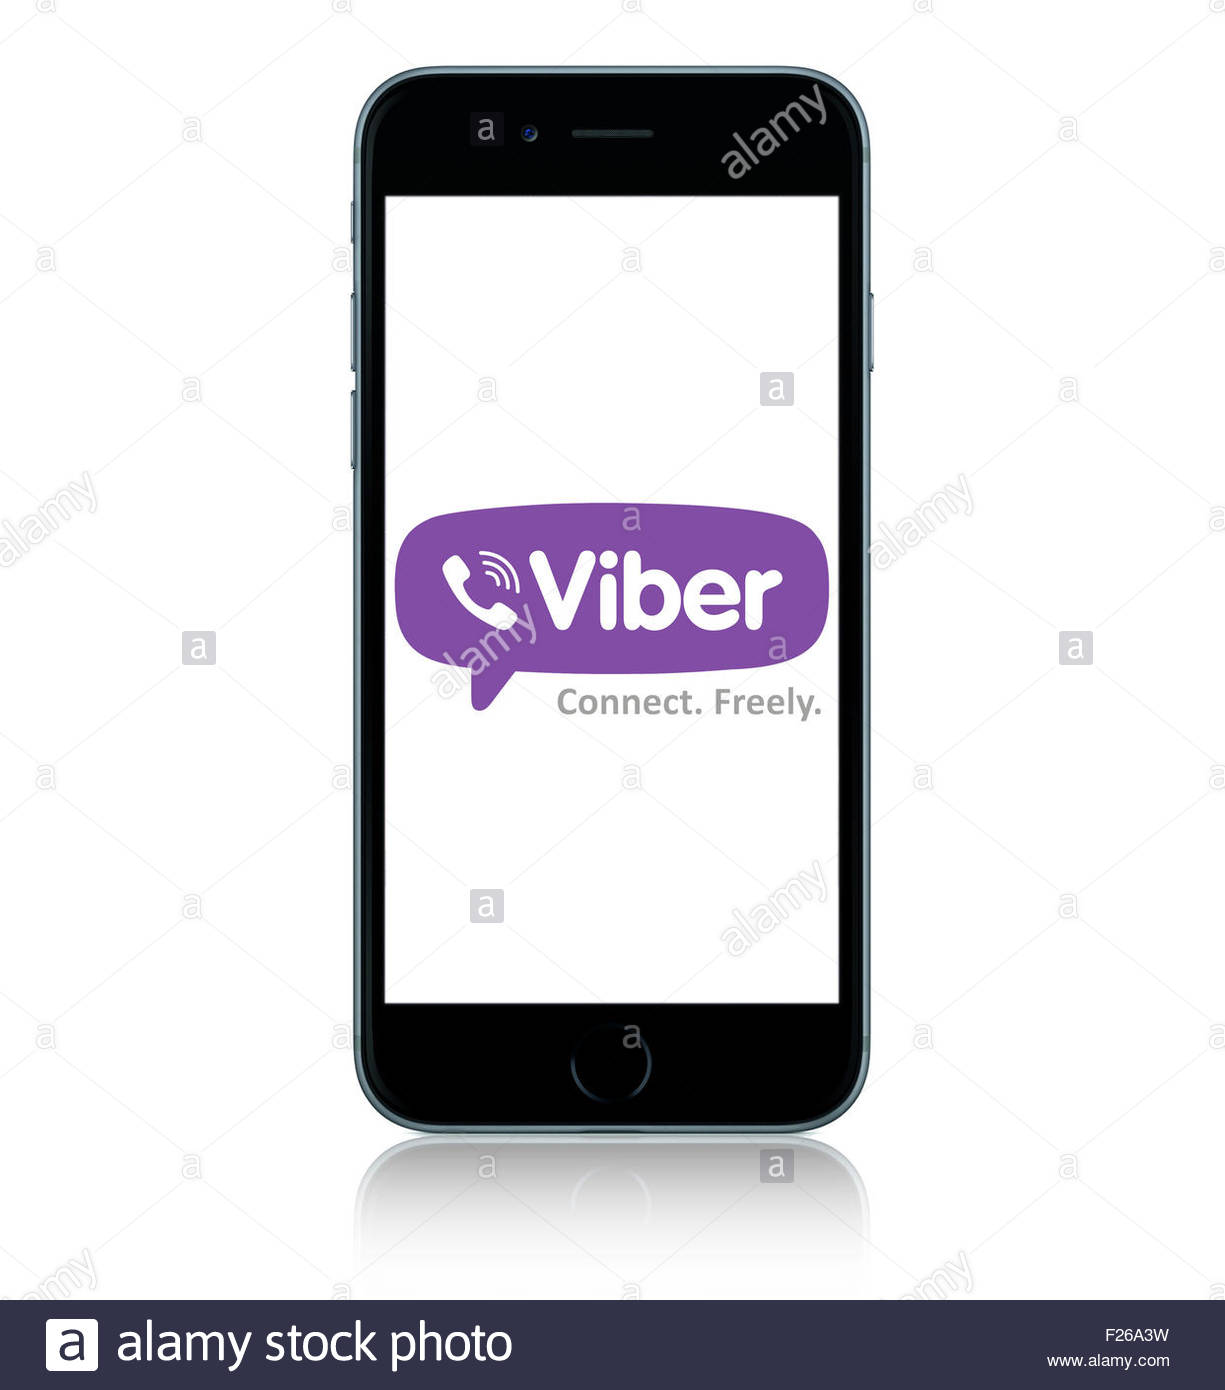 Rakuten Viber Stock Photos & Rakuten Viber Stock Images - Alamy